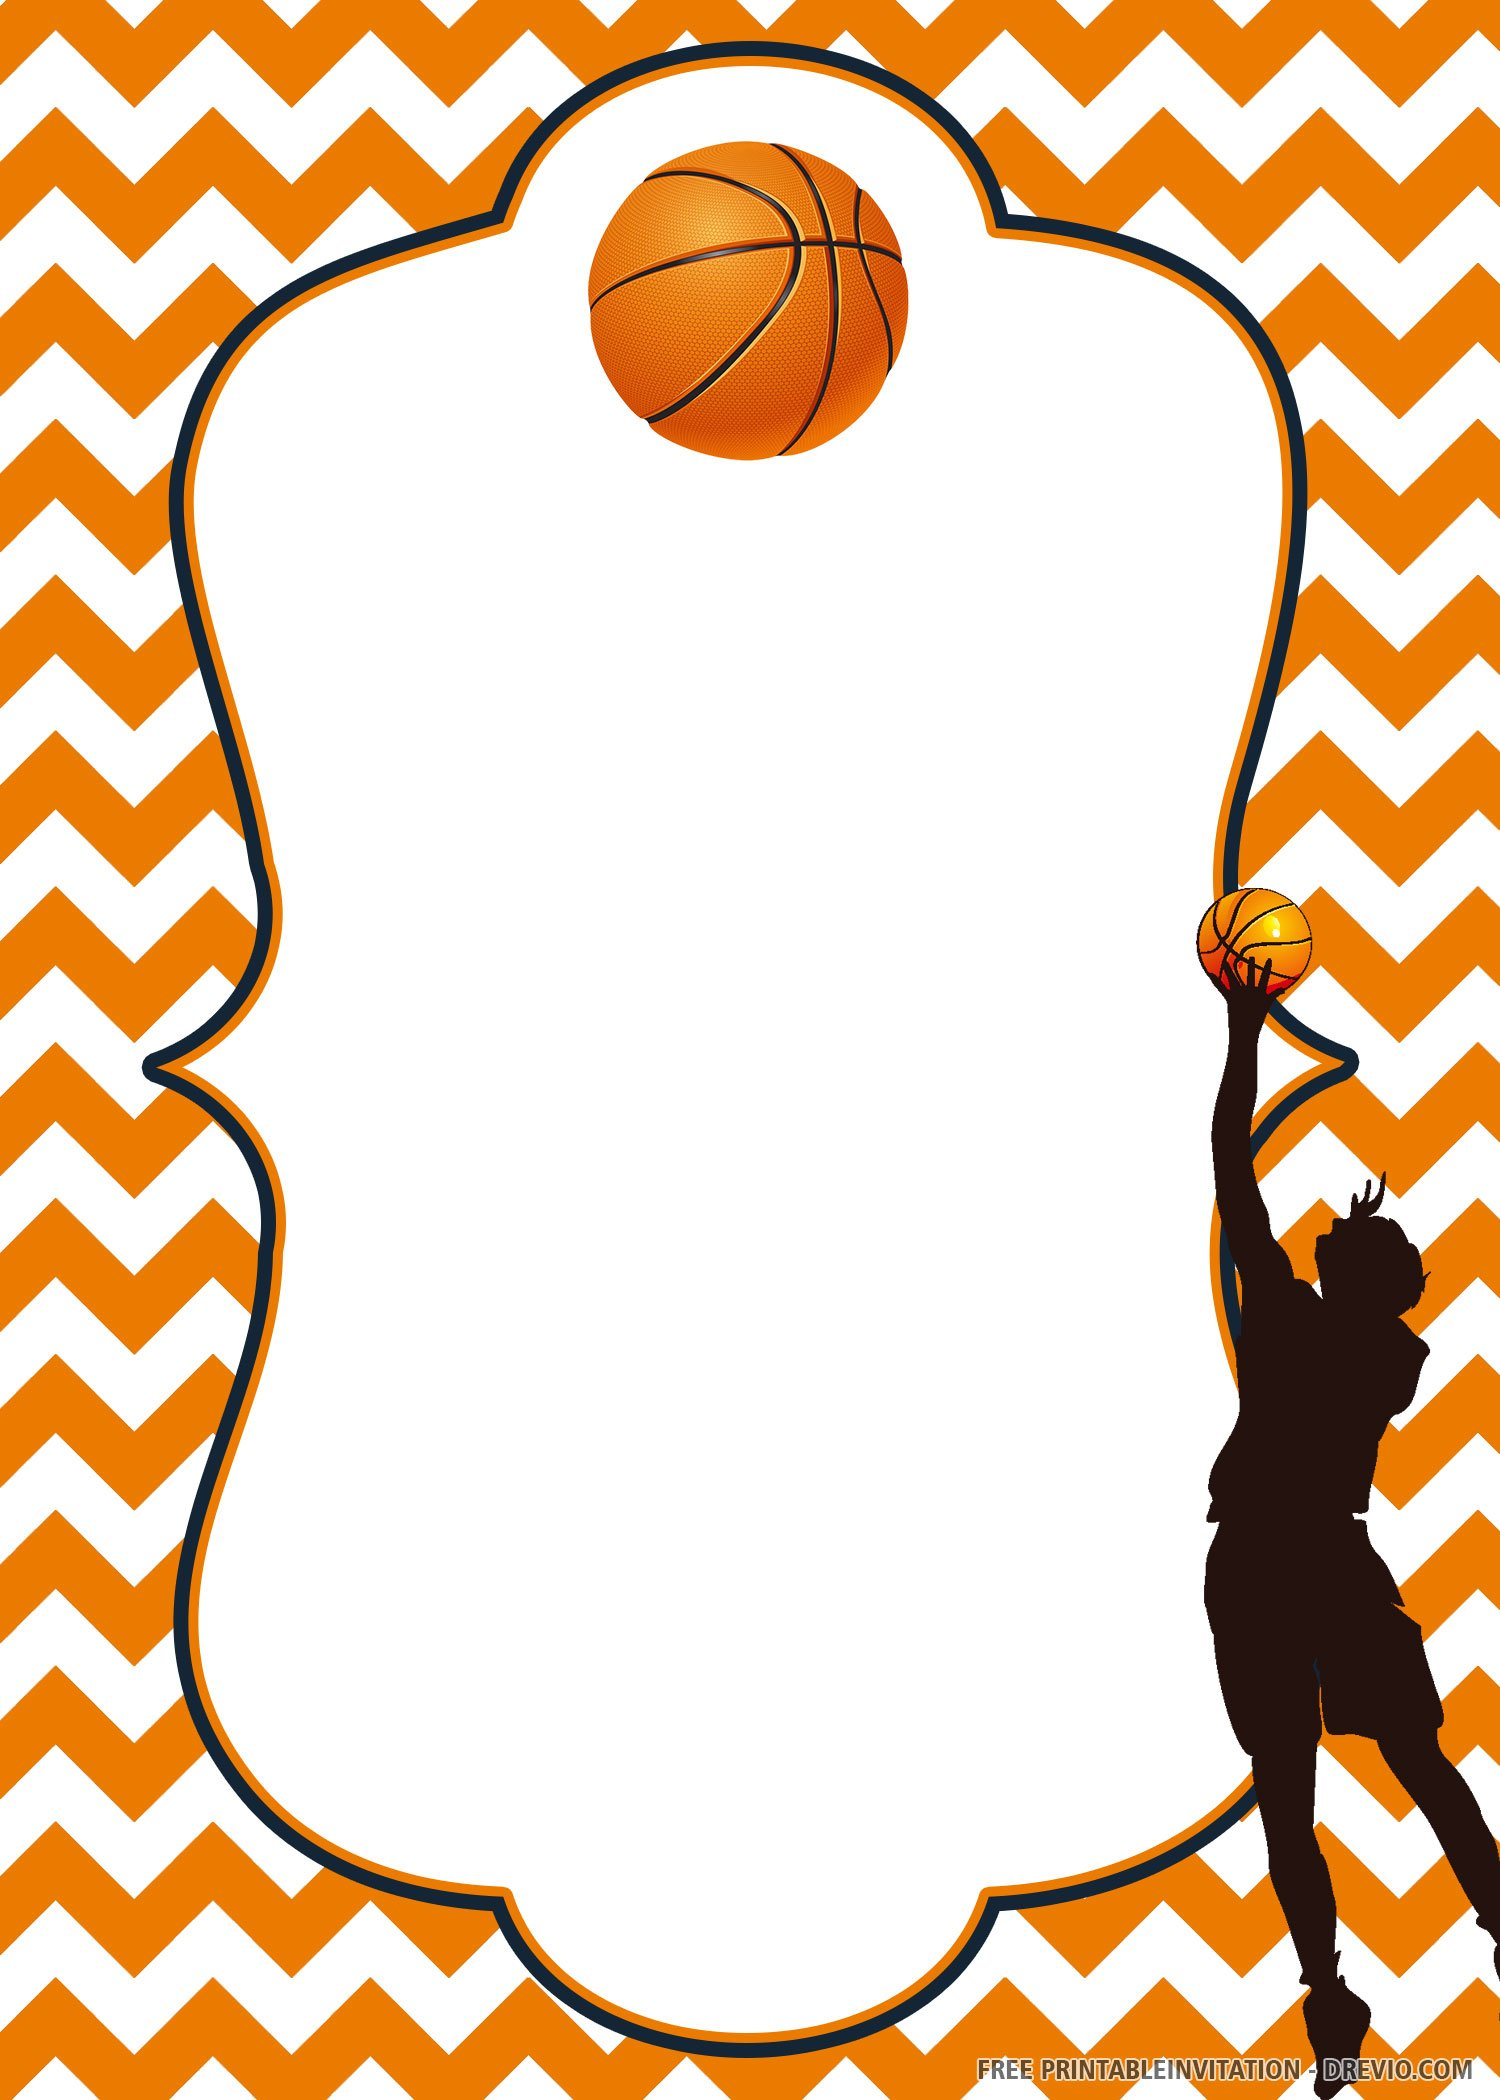 Free Printable Basketball Invitation Templates